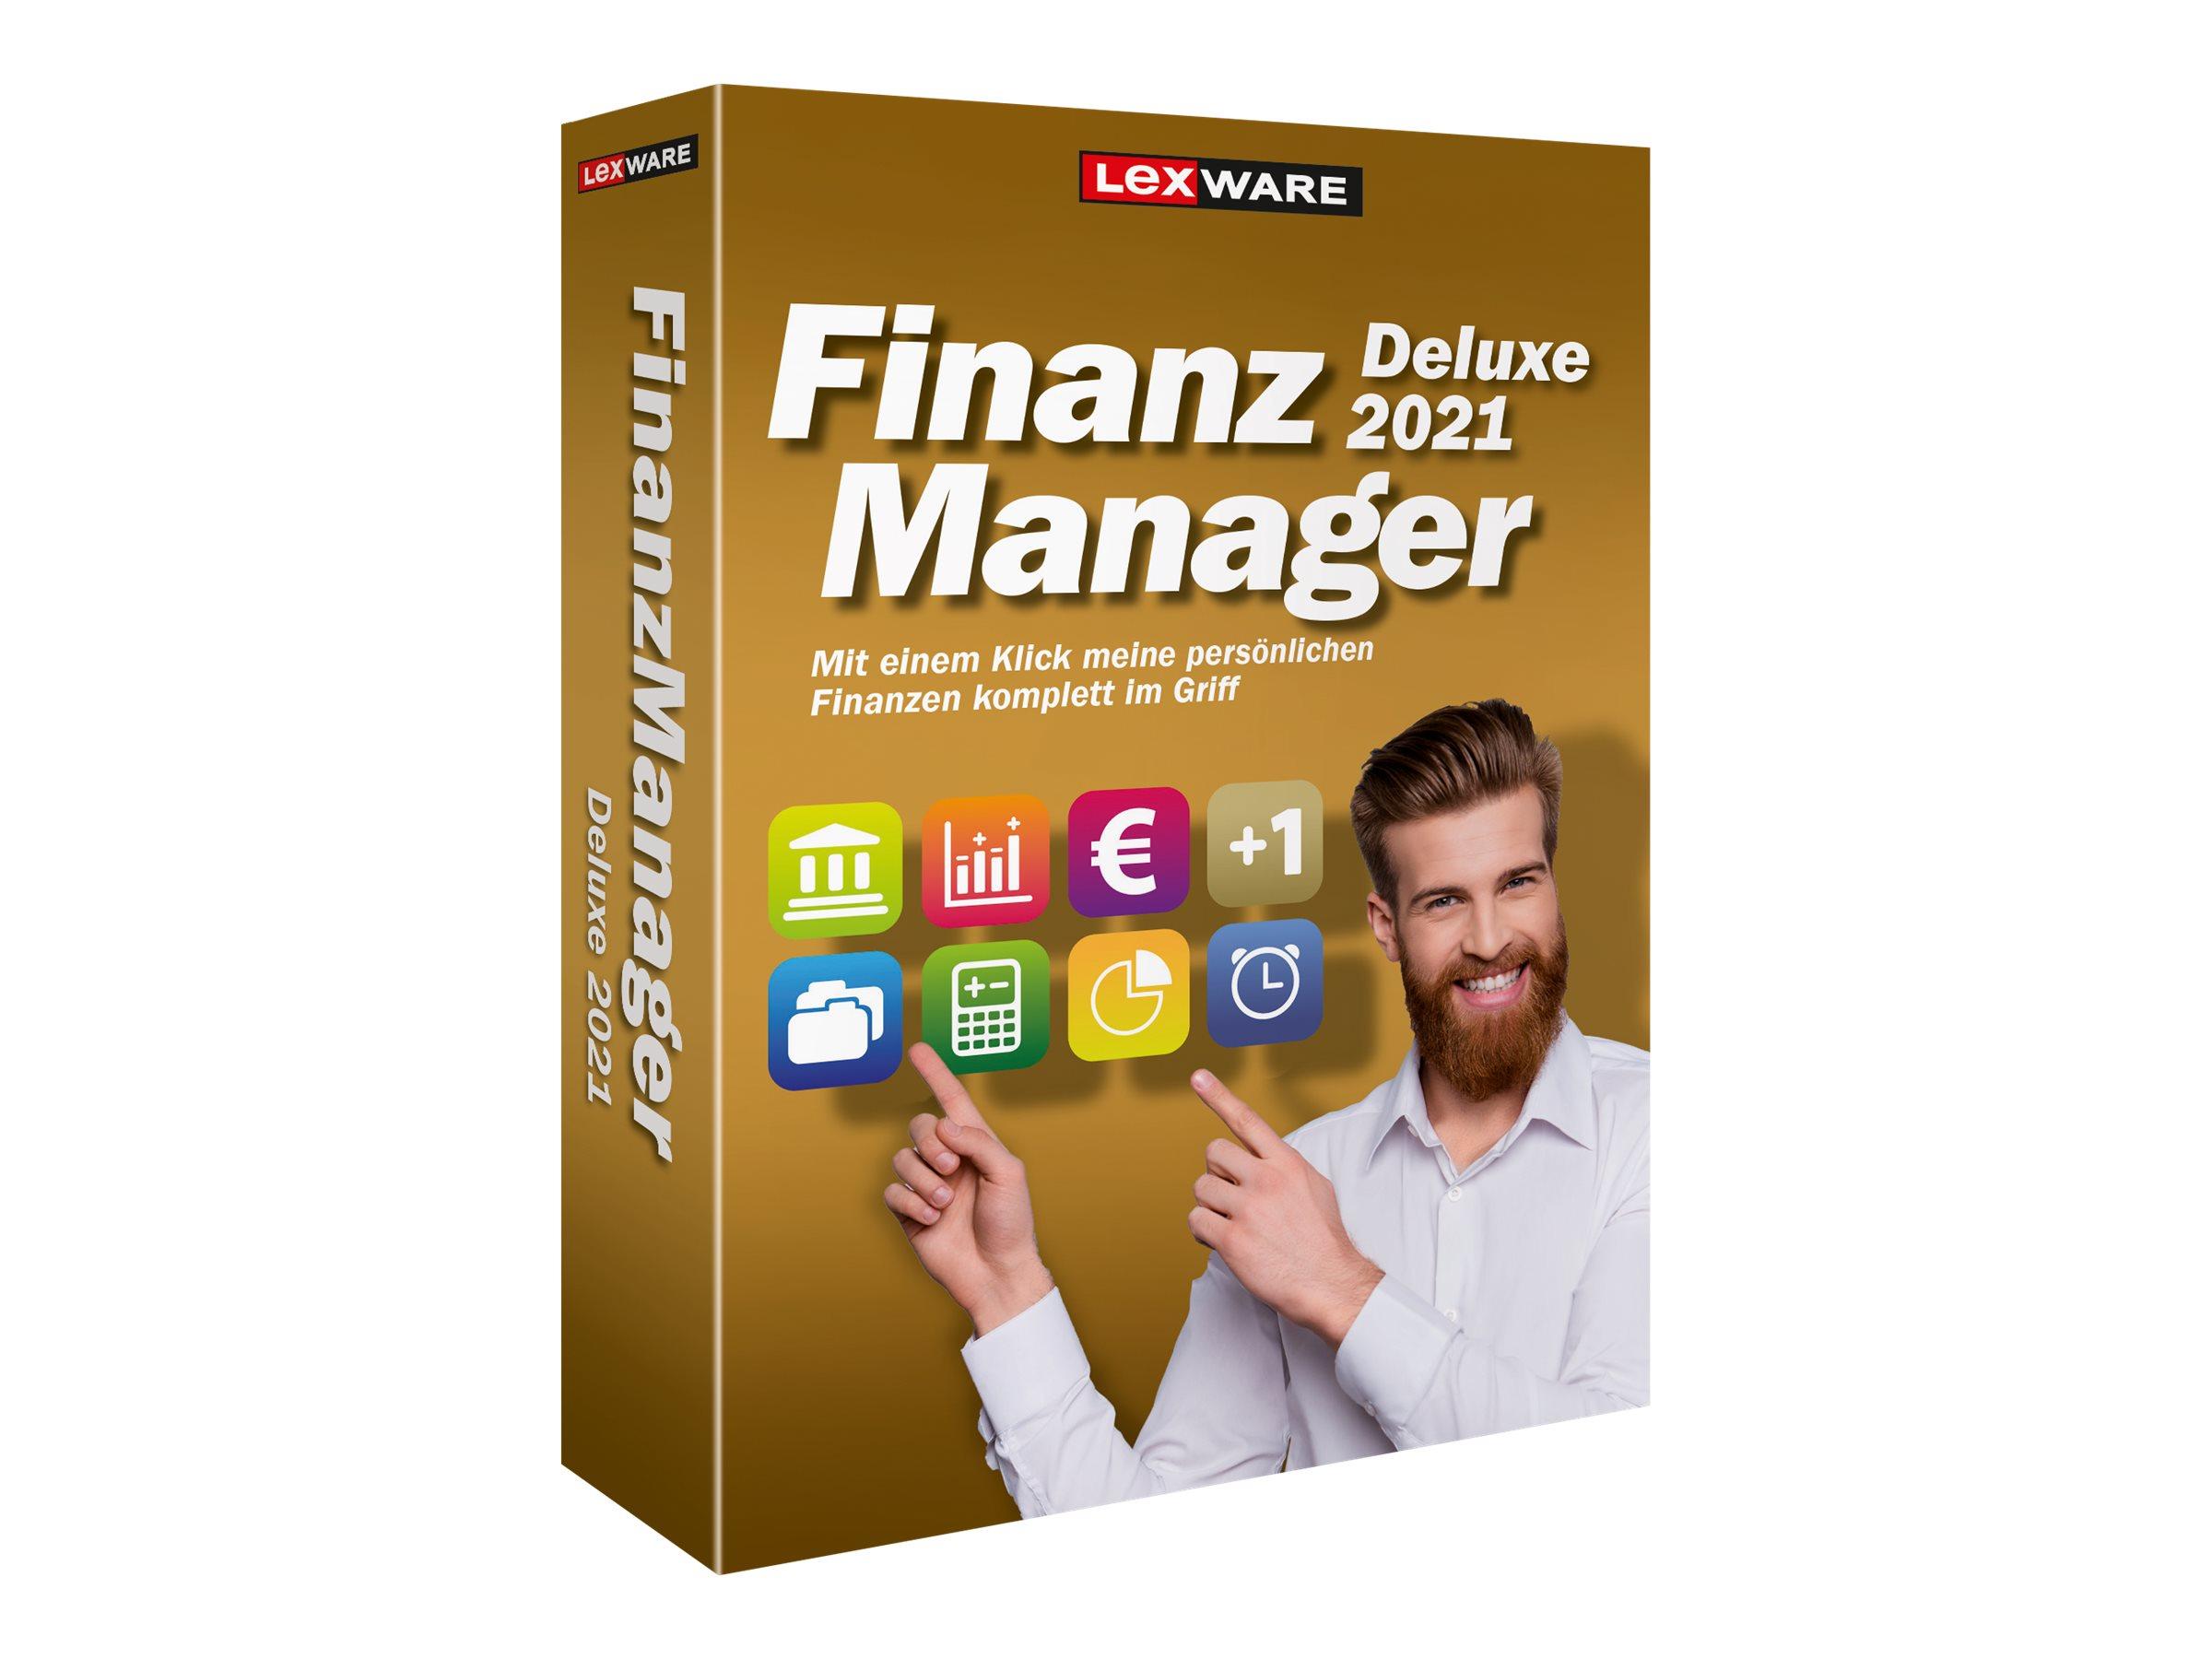 Lexware FinanzManager Deluxe 2021 - Box-Pack (1 Jahr)